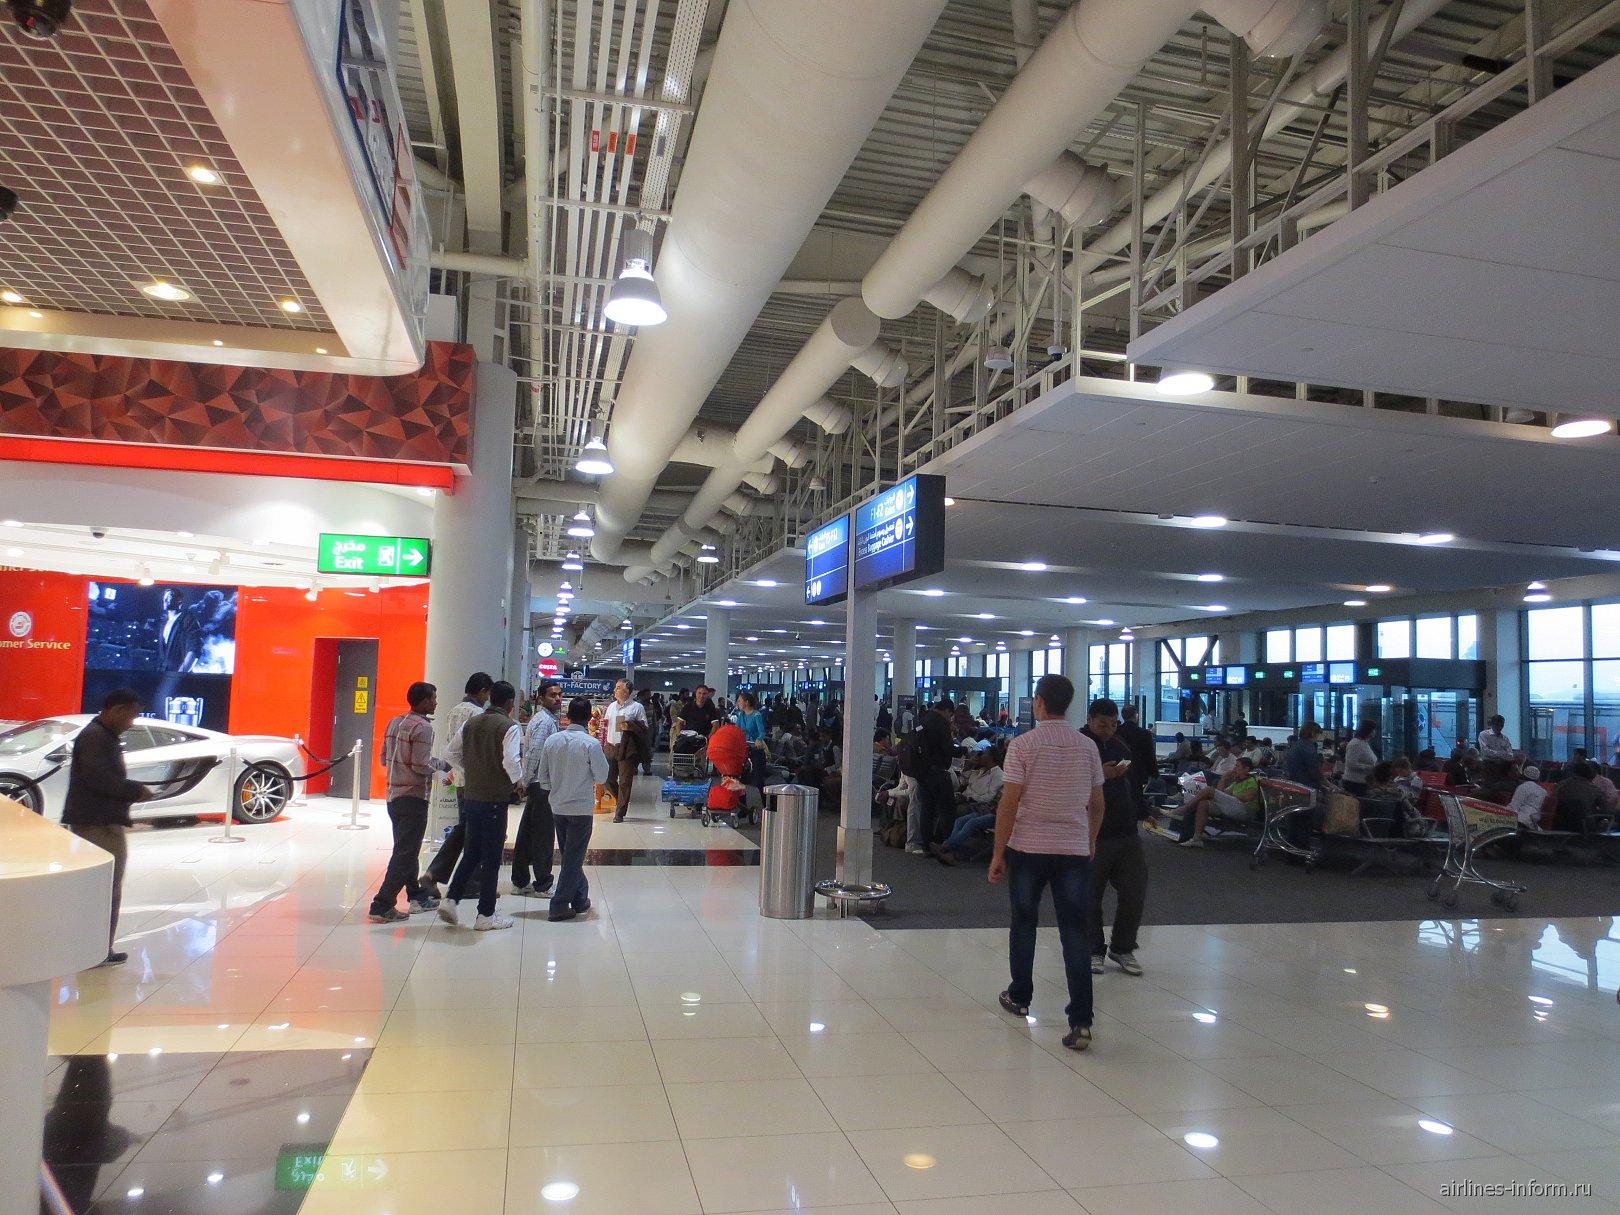 флай Дубай какой терминал в Дубае